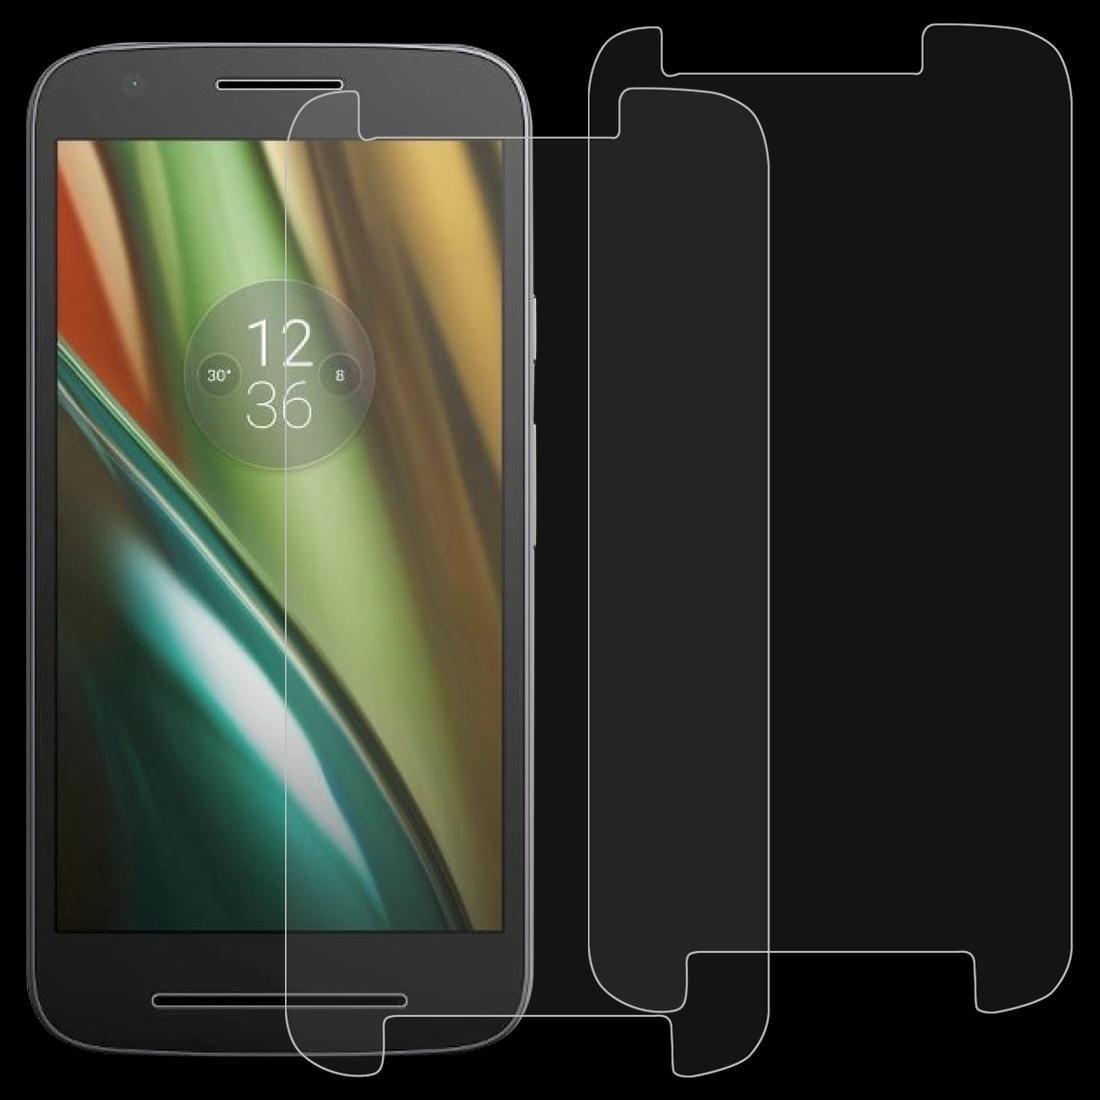 Premium Tempered Glass Screen Film 100 PCS 0.26mm 9H 2.5D Tempered Glass Film for Motorola Moto G4 Play Anti-Scratch Screen Protector